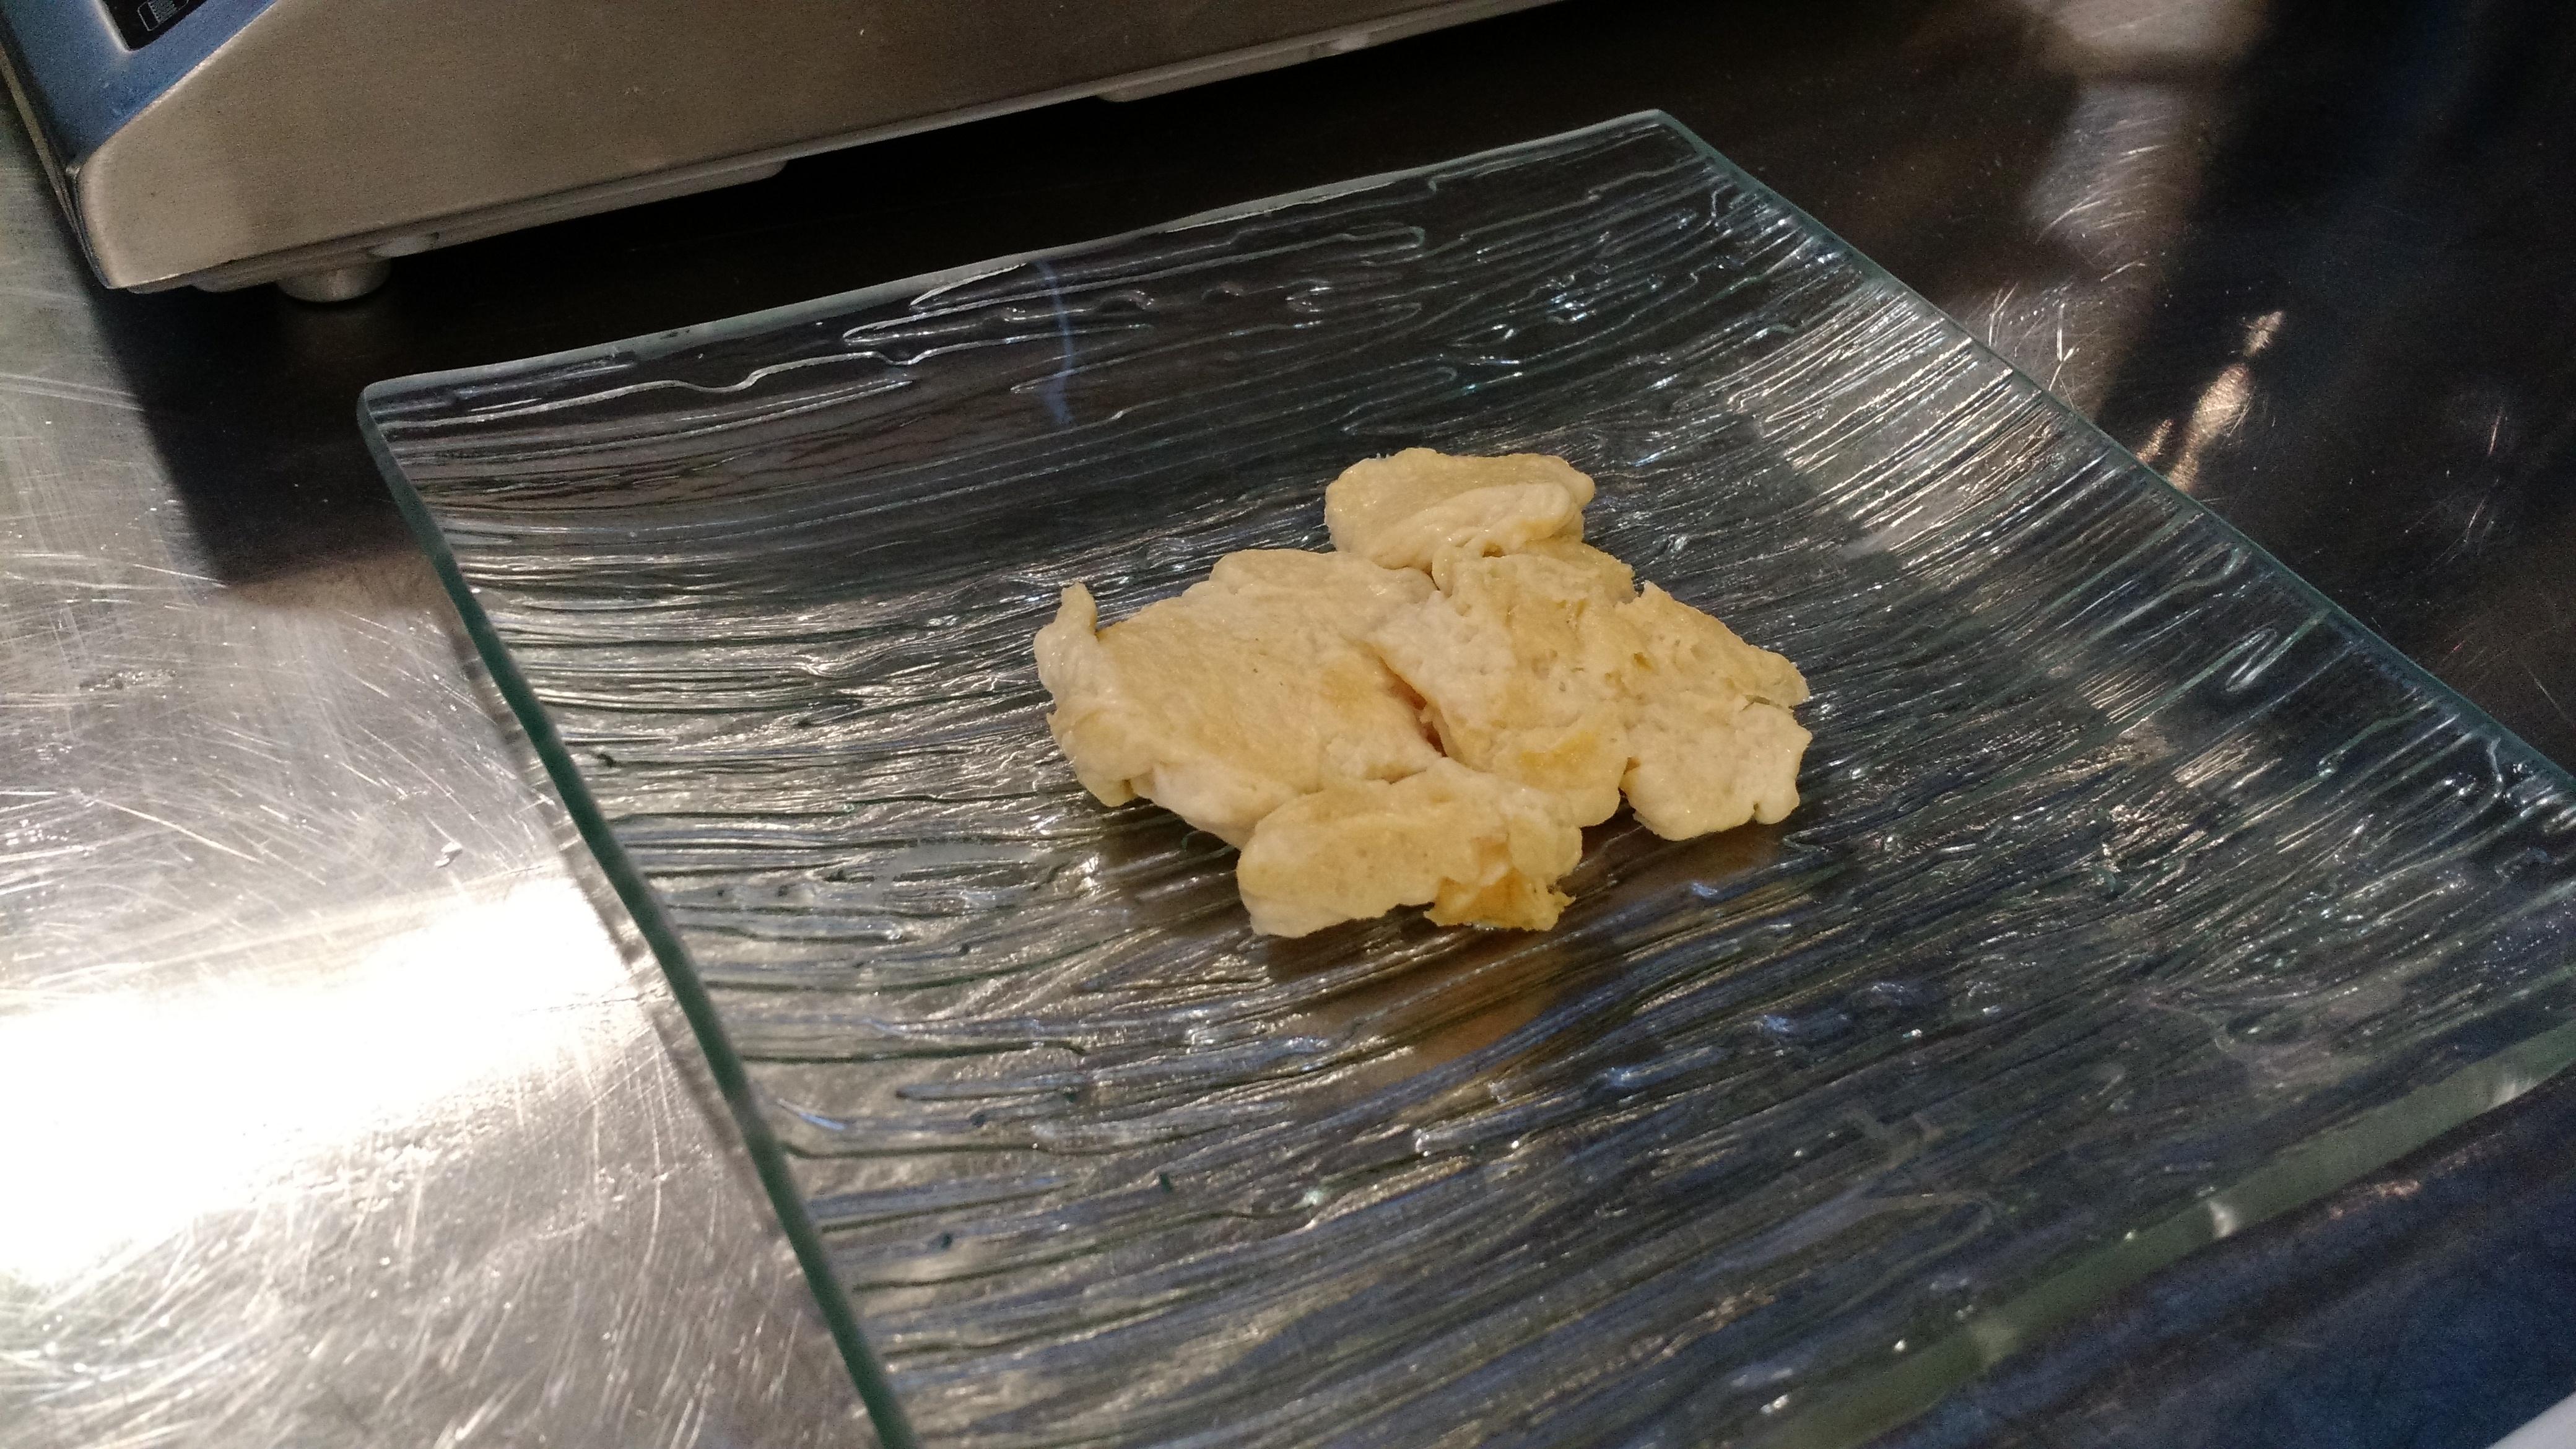 Scrambled eggs, Hampton Creek style, courtesy of research and development chef Ben Roche.